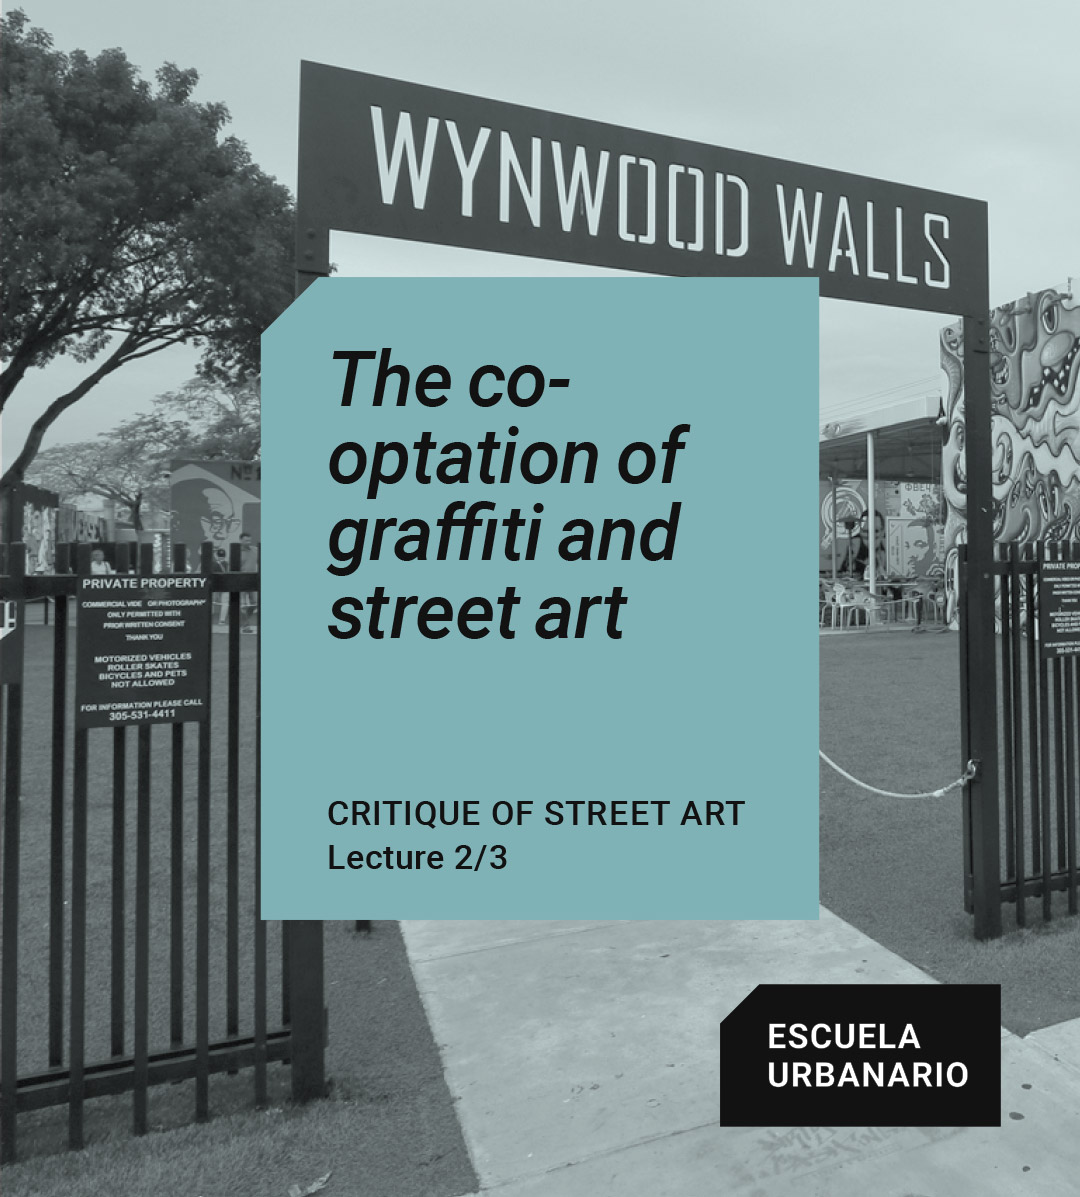 The co-optation of graffiti and street art - Urbanario School